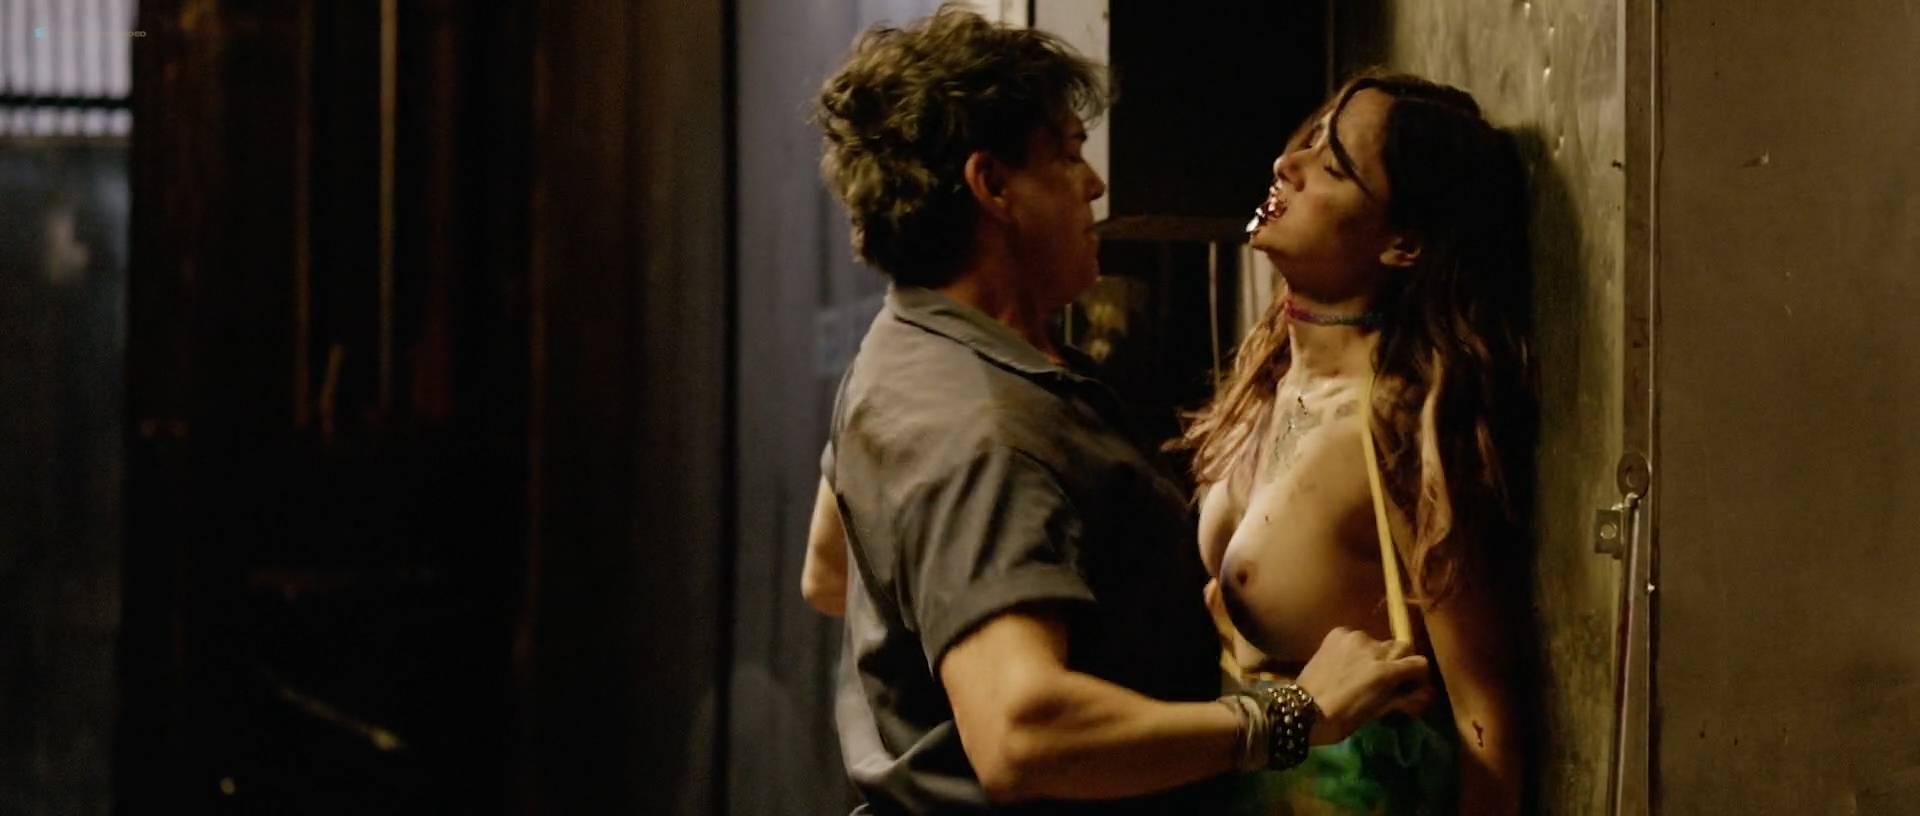 Sara-Malakul-Lane-nude-toples-Kelly-McCart-and-Amanda-Ruth-Ritchie-nude-too-Halloween-Pussy-Trap-Kill-Kill-2017-HD-1080p-Web-013.jpg